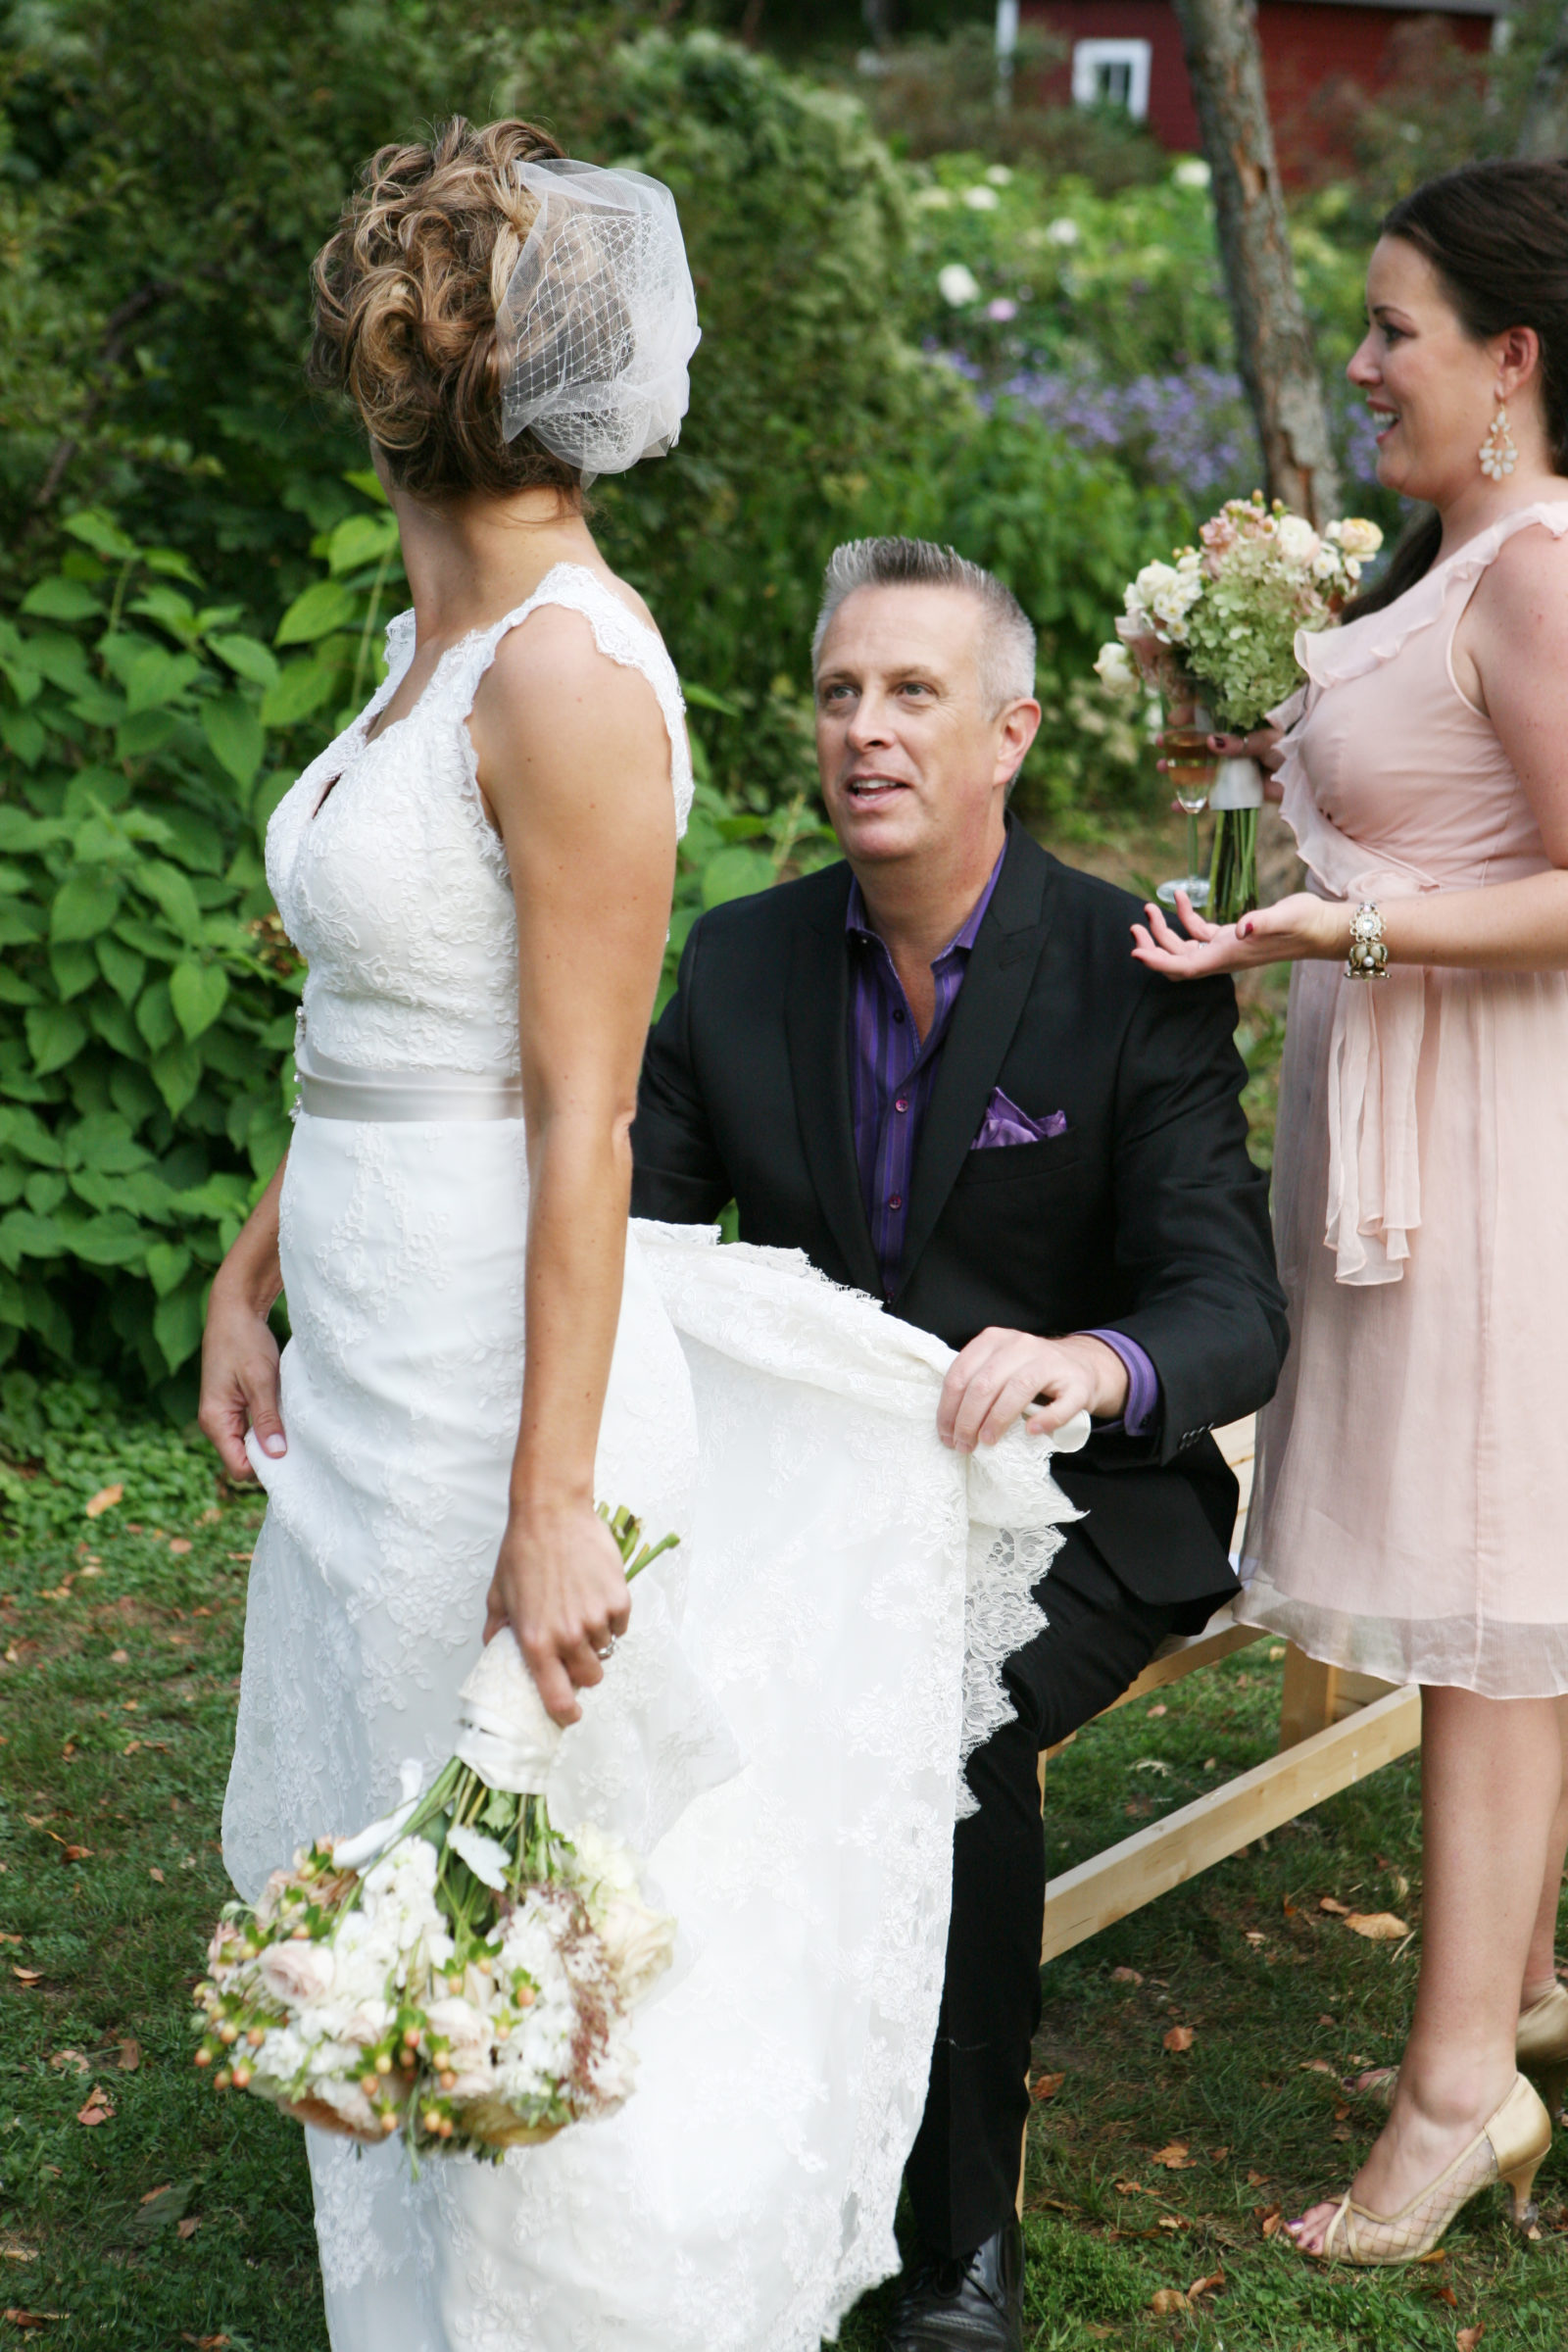 Wedding Guy Bruce Vassar helps bride with dress train